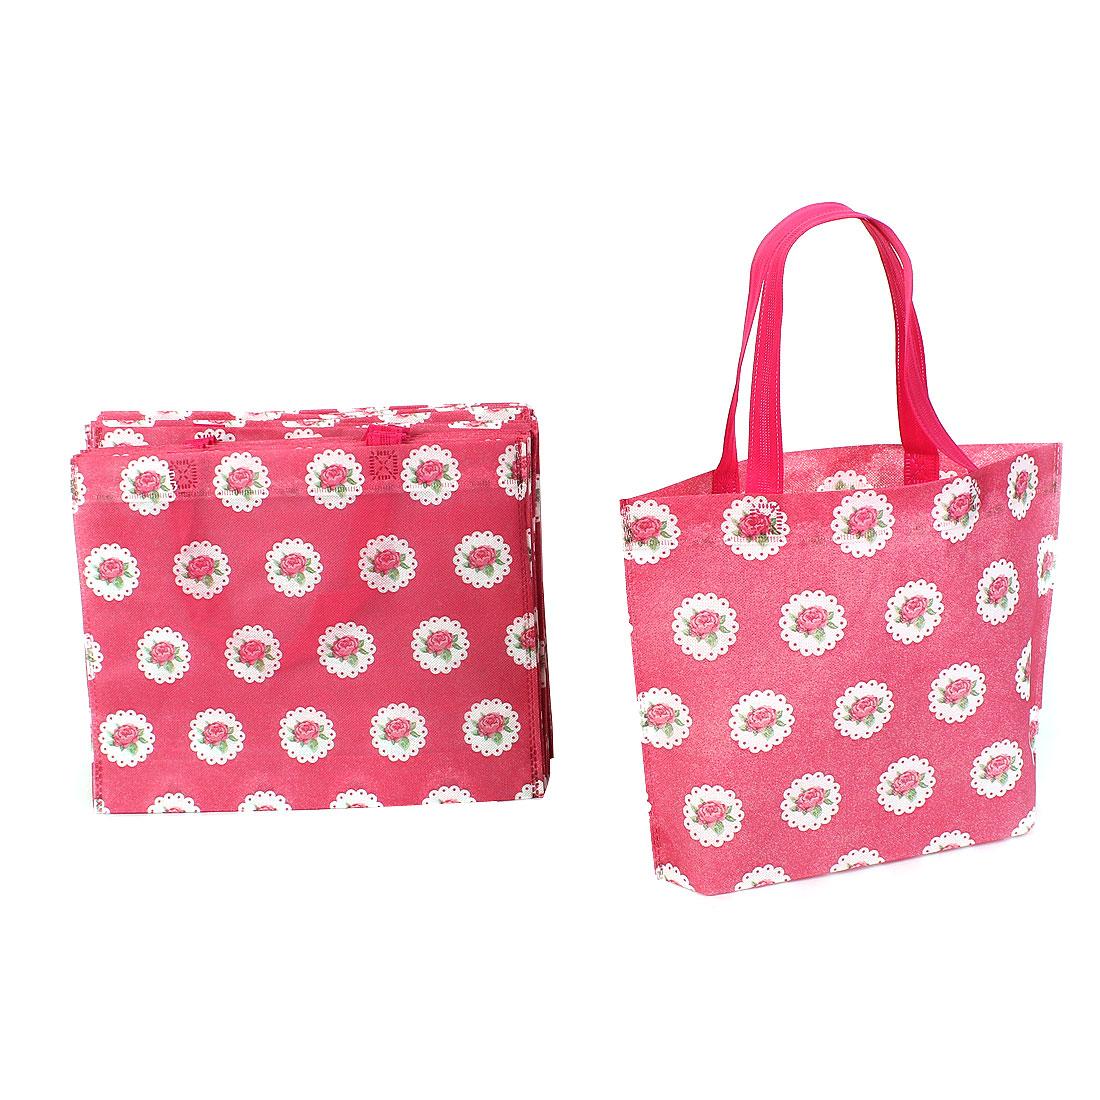 Non Woven Flower Pattern Reusable Shopping Bag 35cm x 28cm Red 20 Pcs